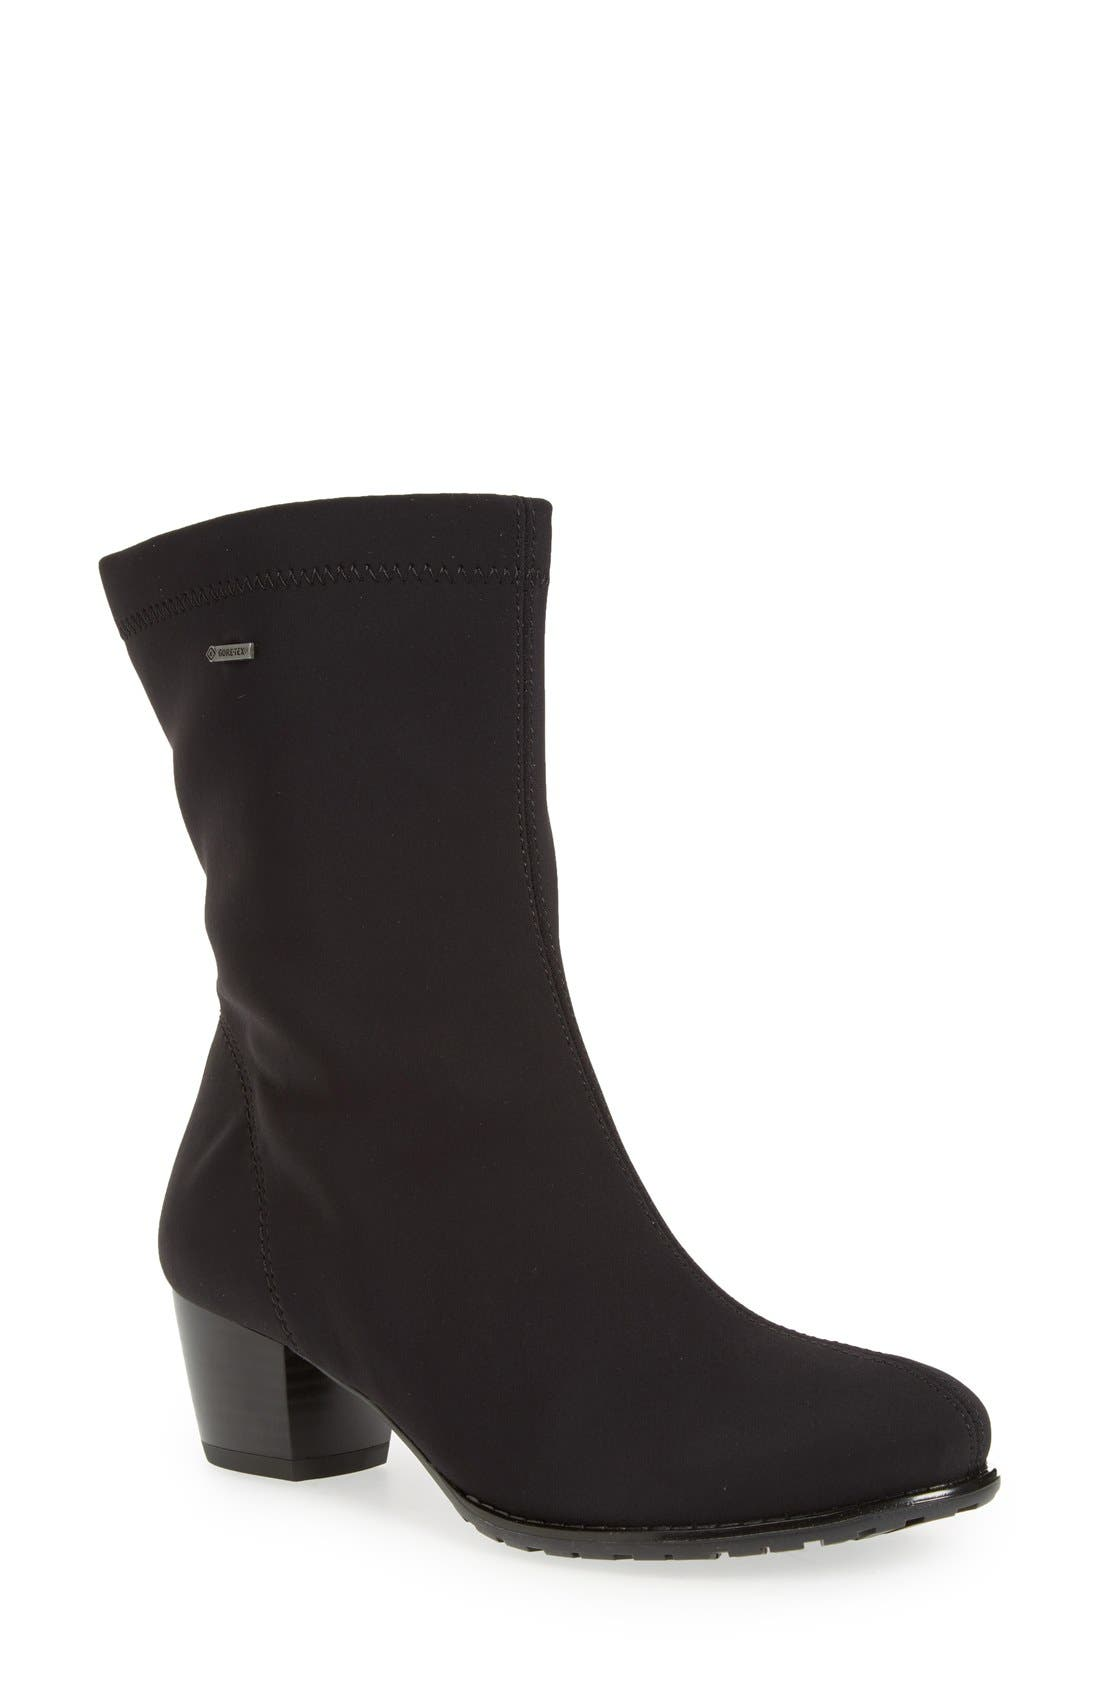 'Fairfax' Waterproof Gore-Tex<sup>®</sup> Block Heel Boot,                         Main,                         color, 001